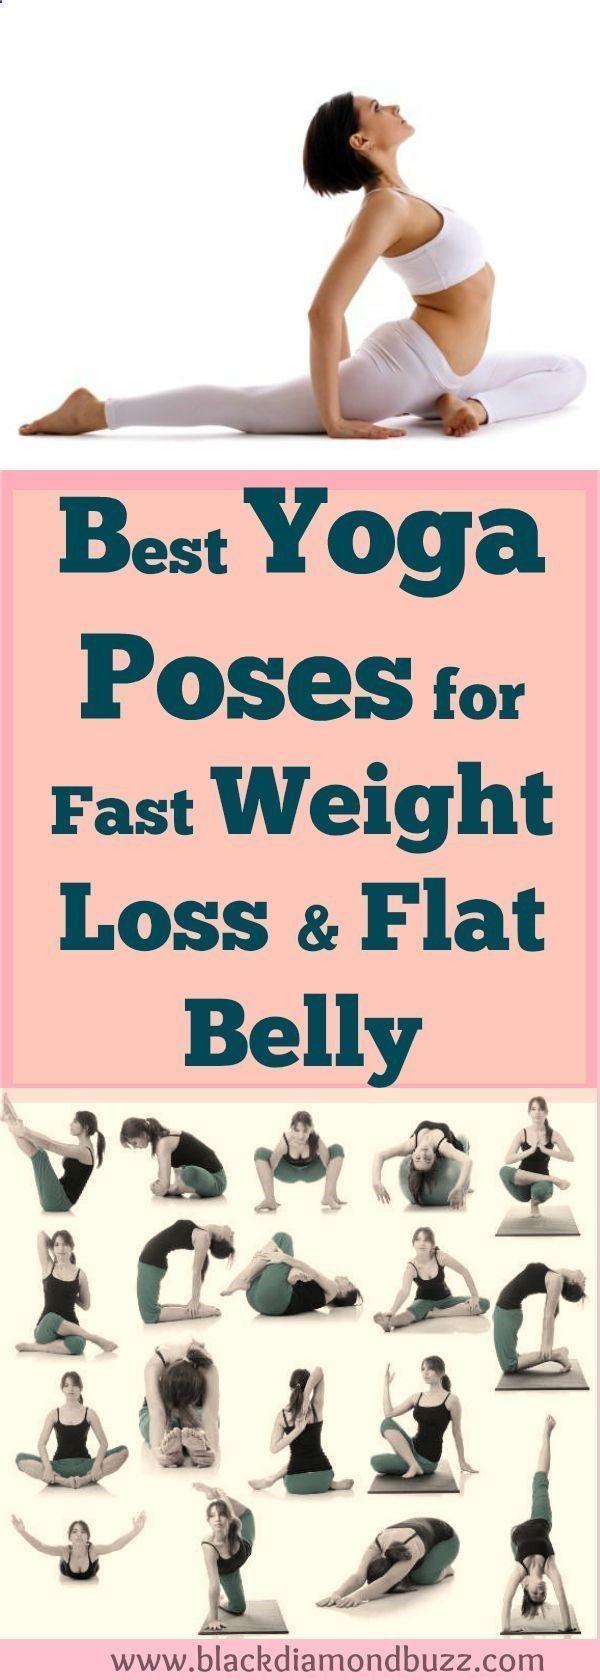 Quick 5 lb weight loss tips #fatlosstips :)   ten easy ways to lose weight#weightlossjourney #fitnes...